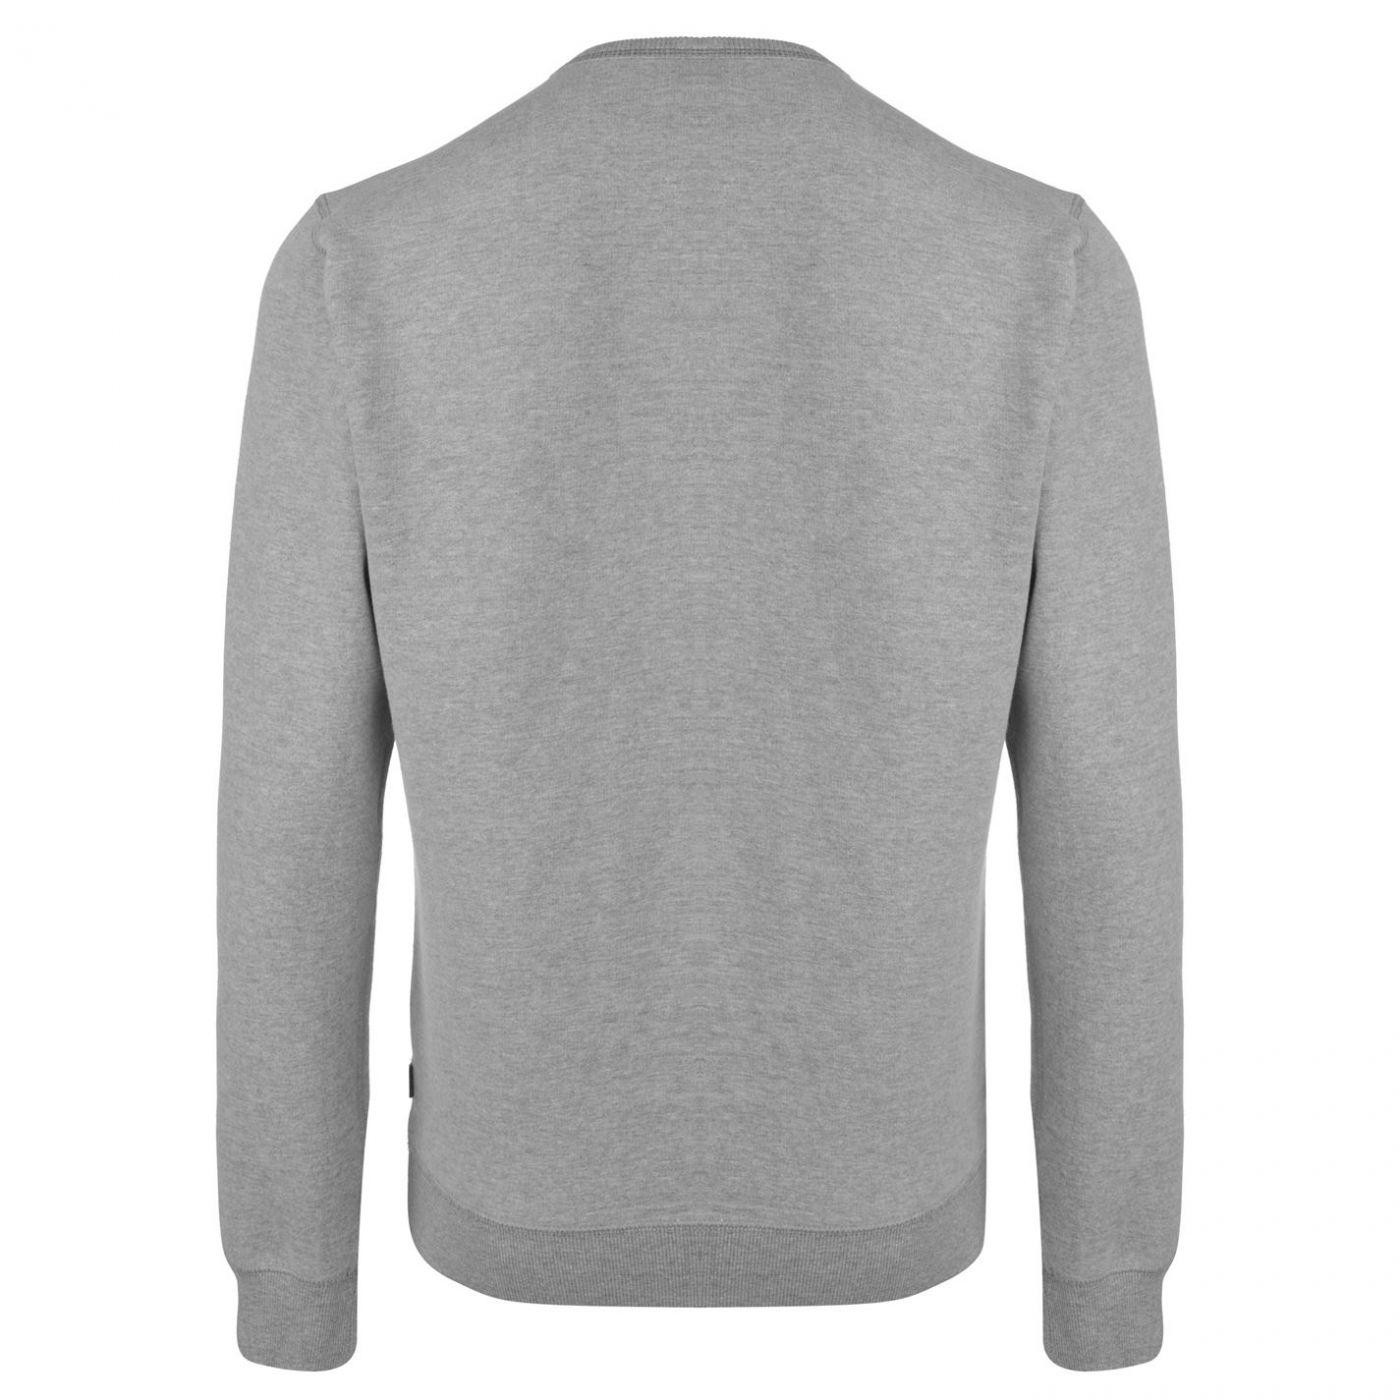 883 Police Eston Sweater